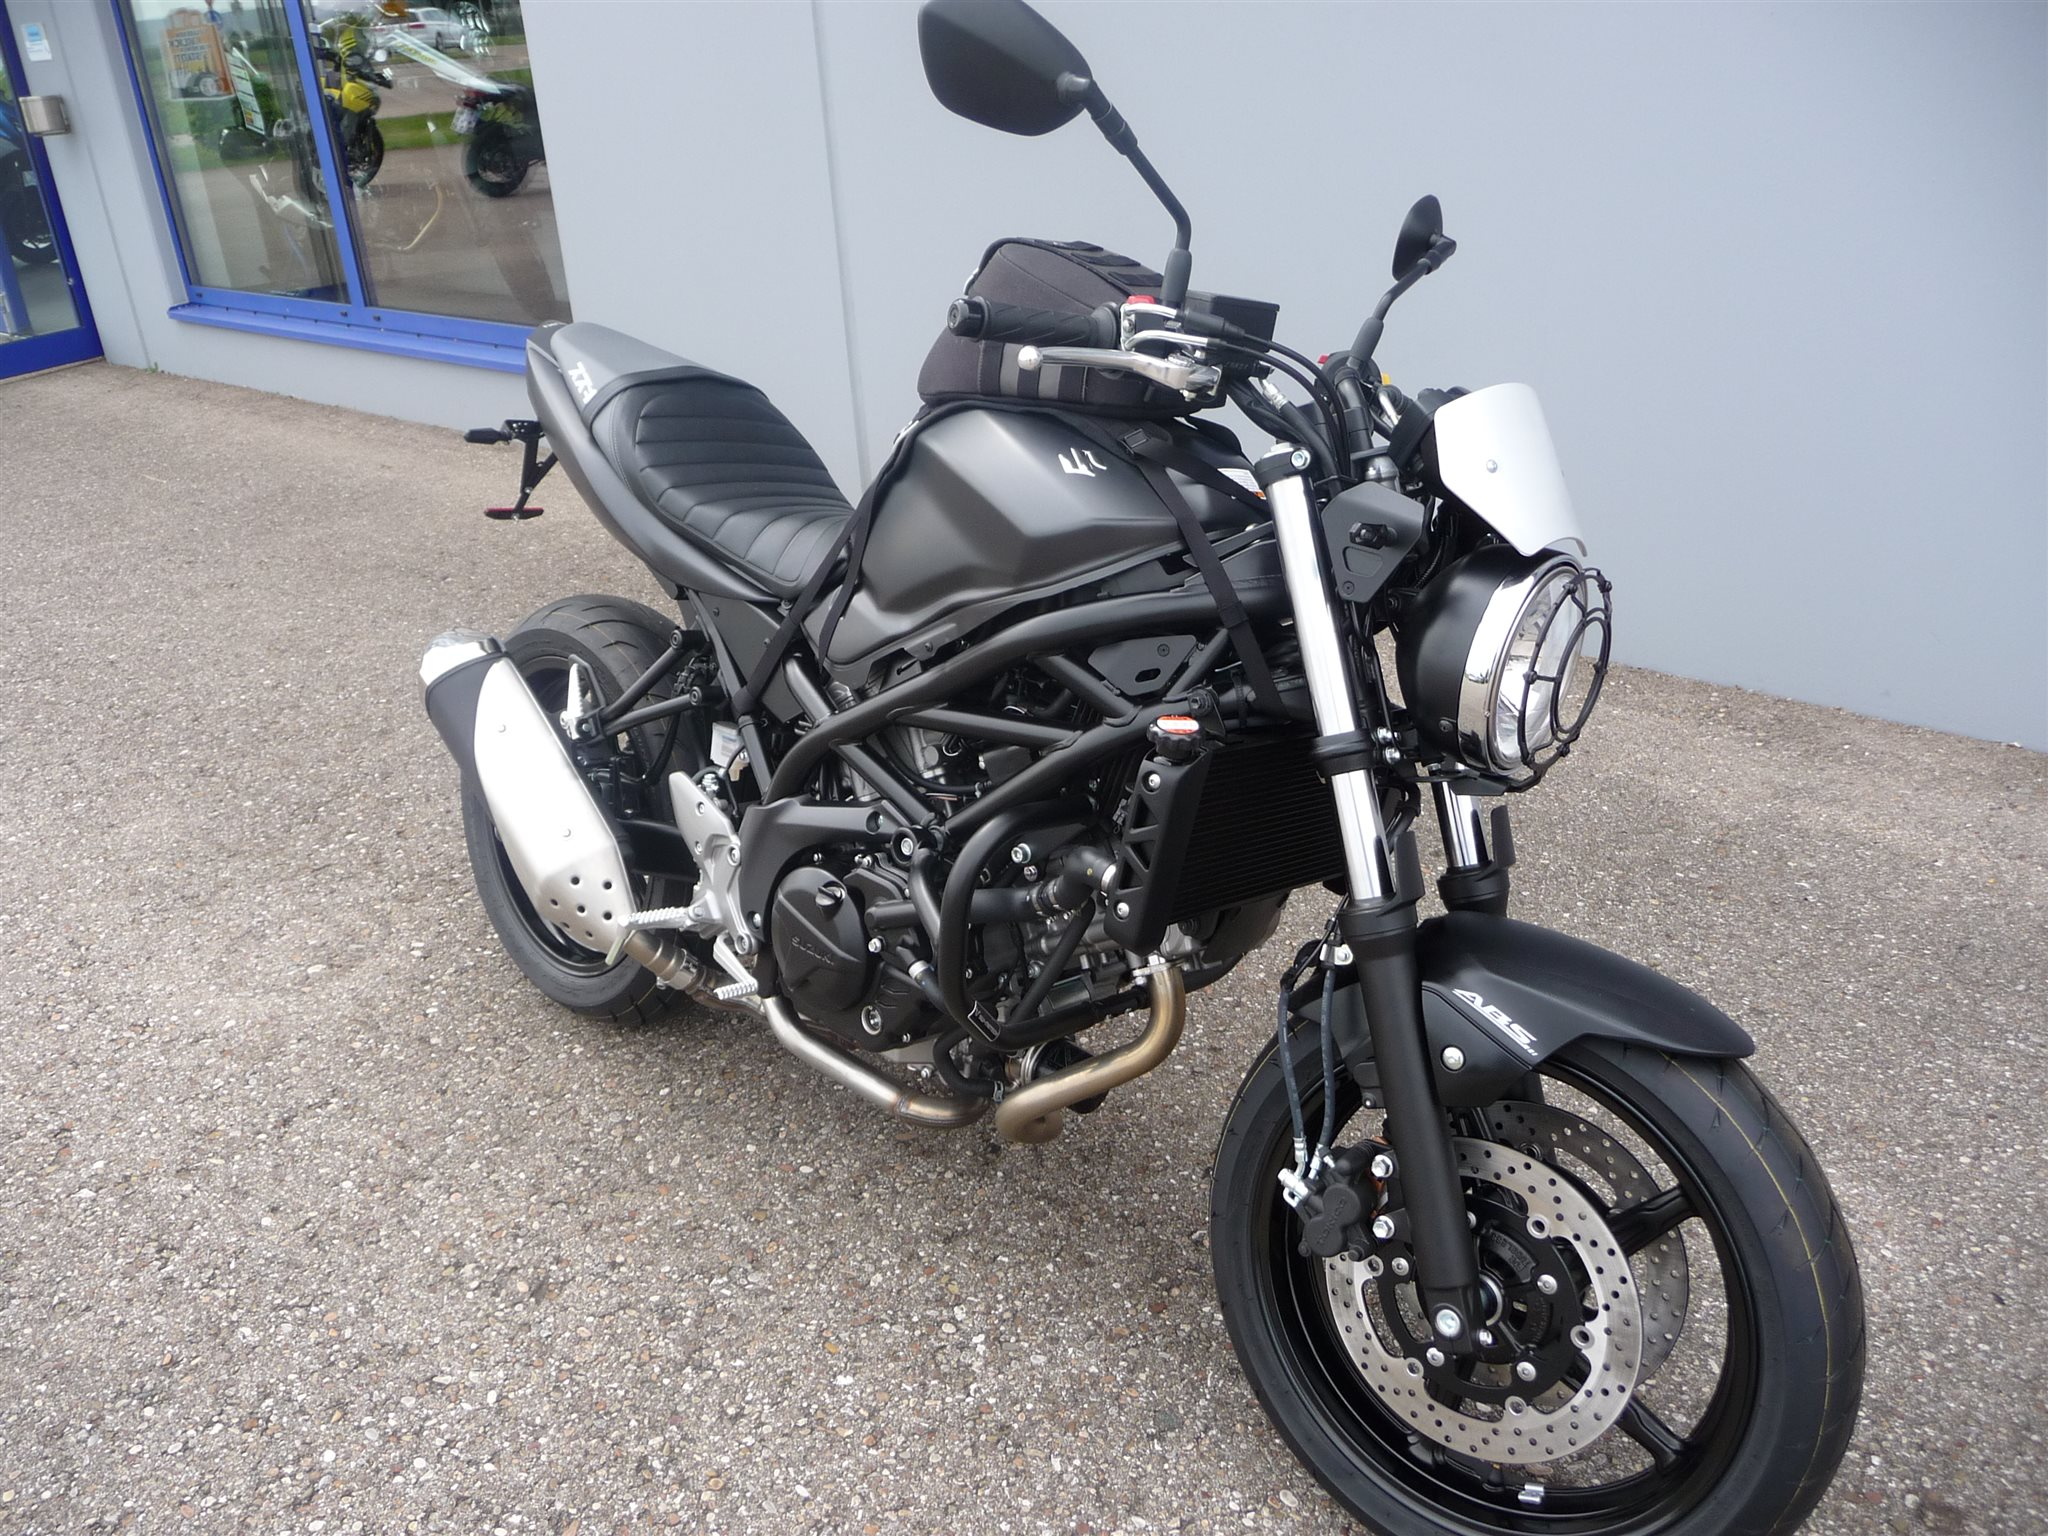 details zum custom bike suzuki sv 650 des h ndlers biker stable gmbh co kg. Black Bedroom Furniture Sets. Home Design Ideas